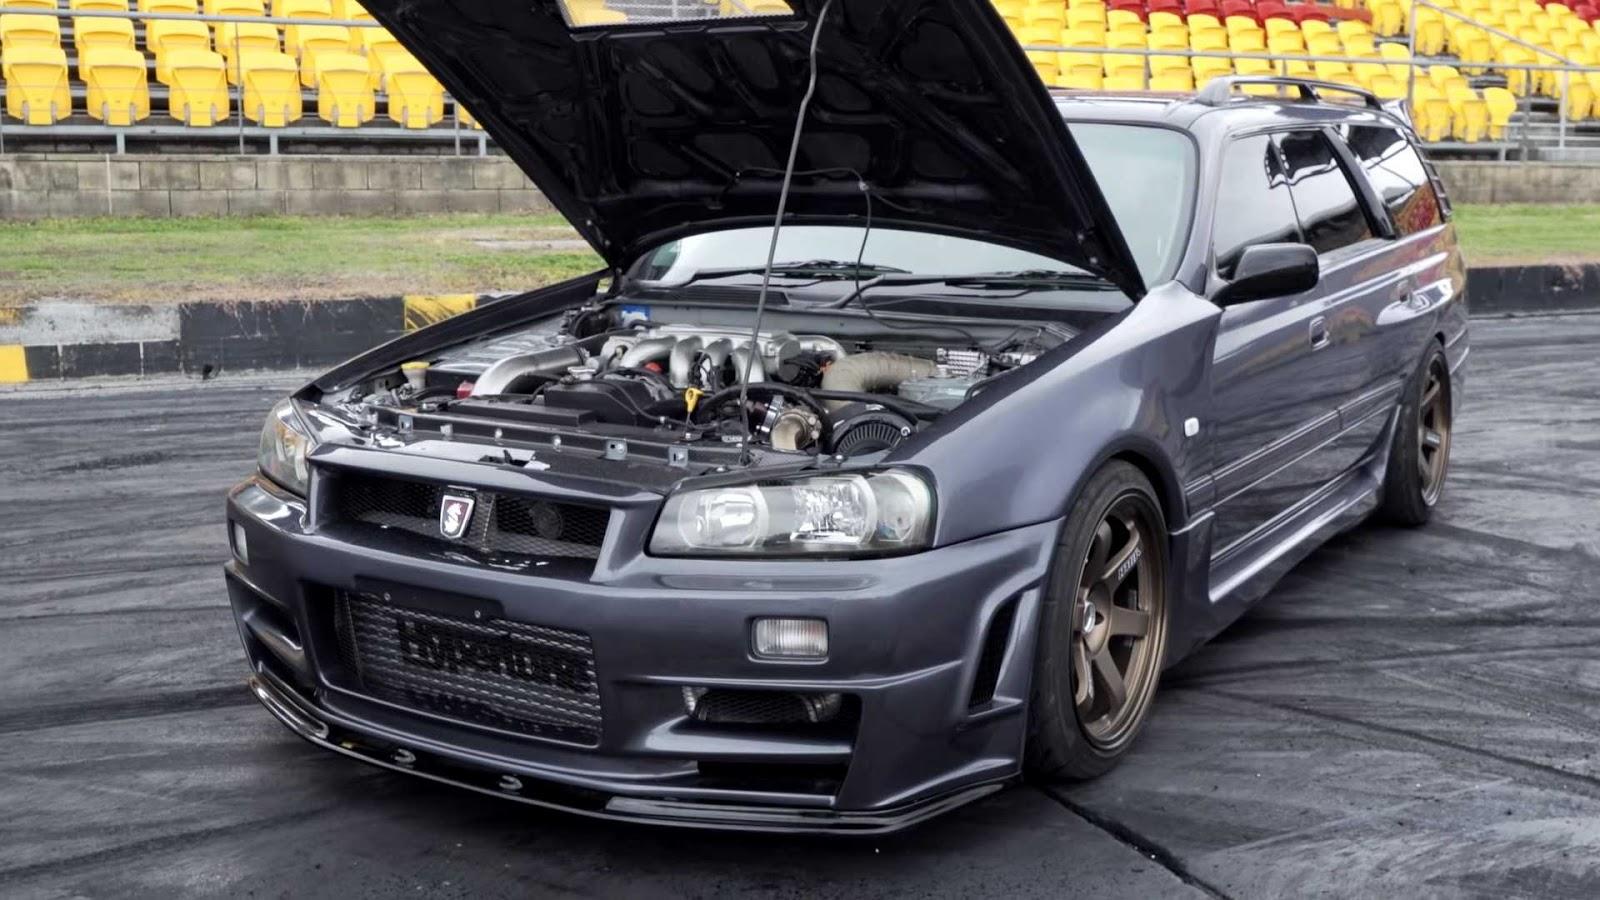 Nissan Clube: Custom Nissan Stagea V8 Wagon